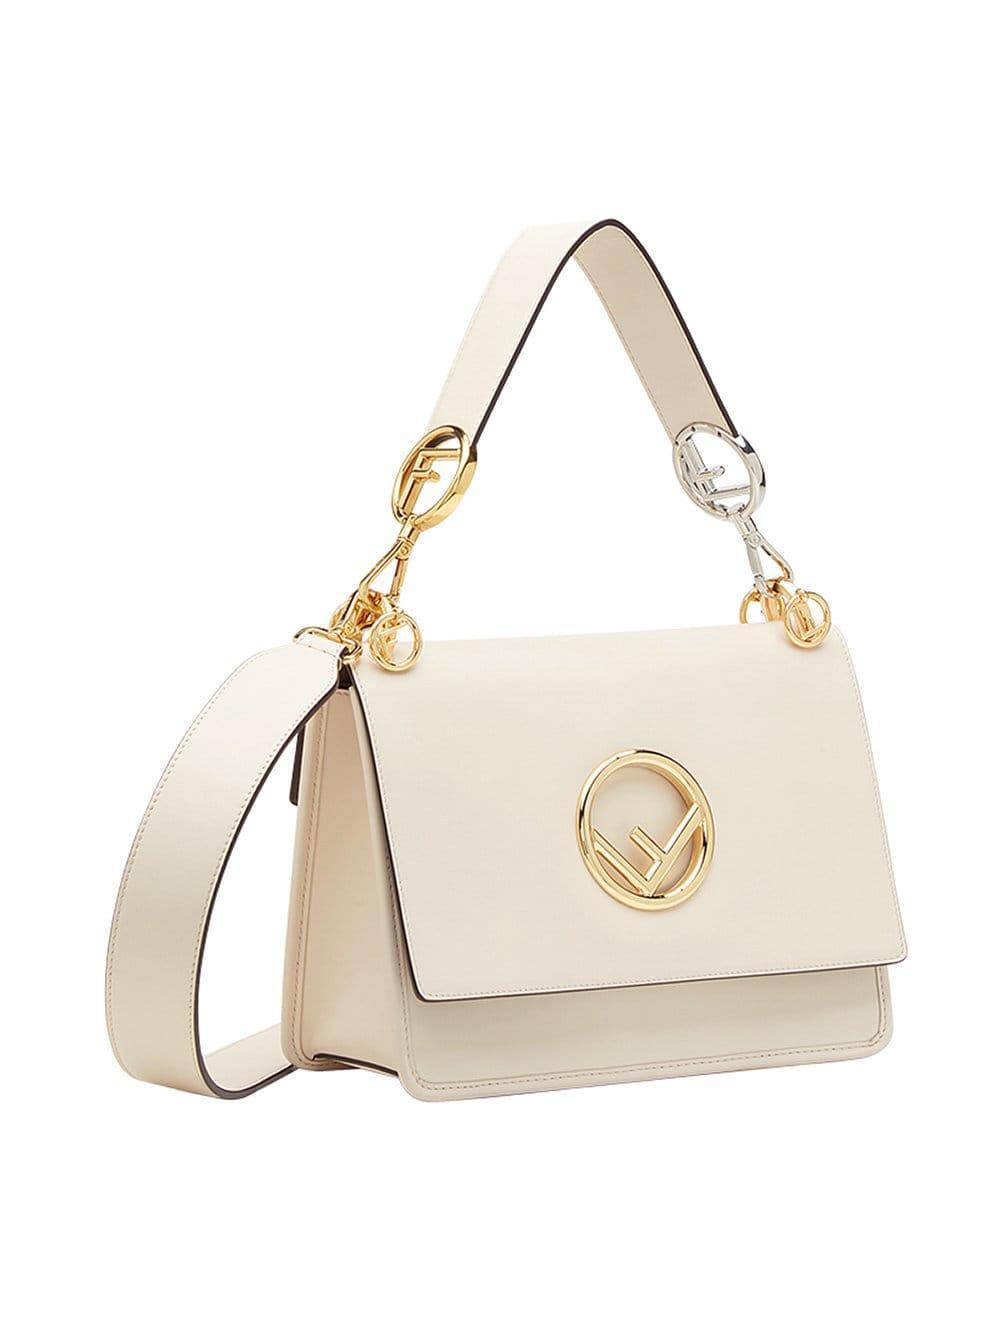 42140244f91f Fendi White Kan I F Leather Shoulder Bag in White - Lyst